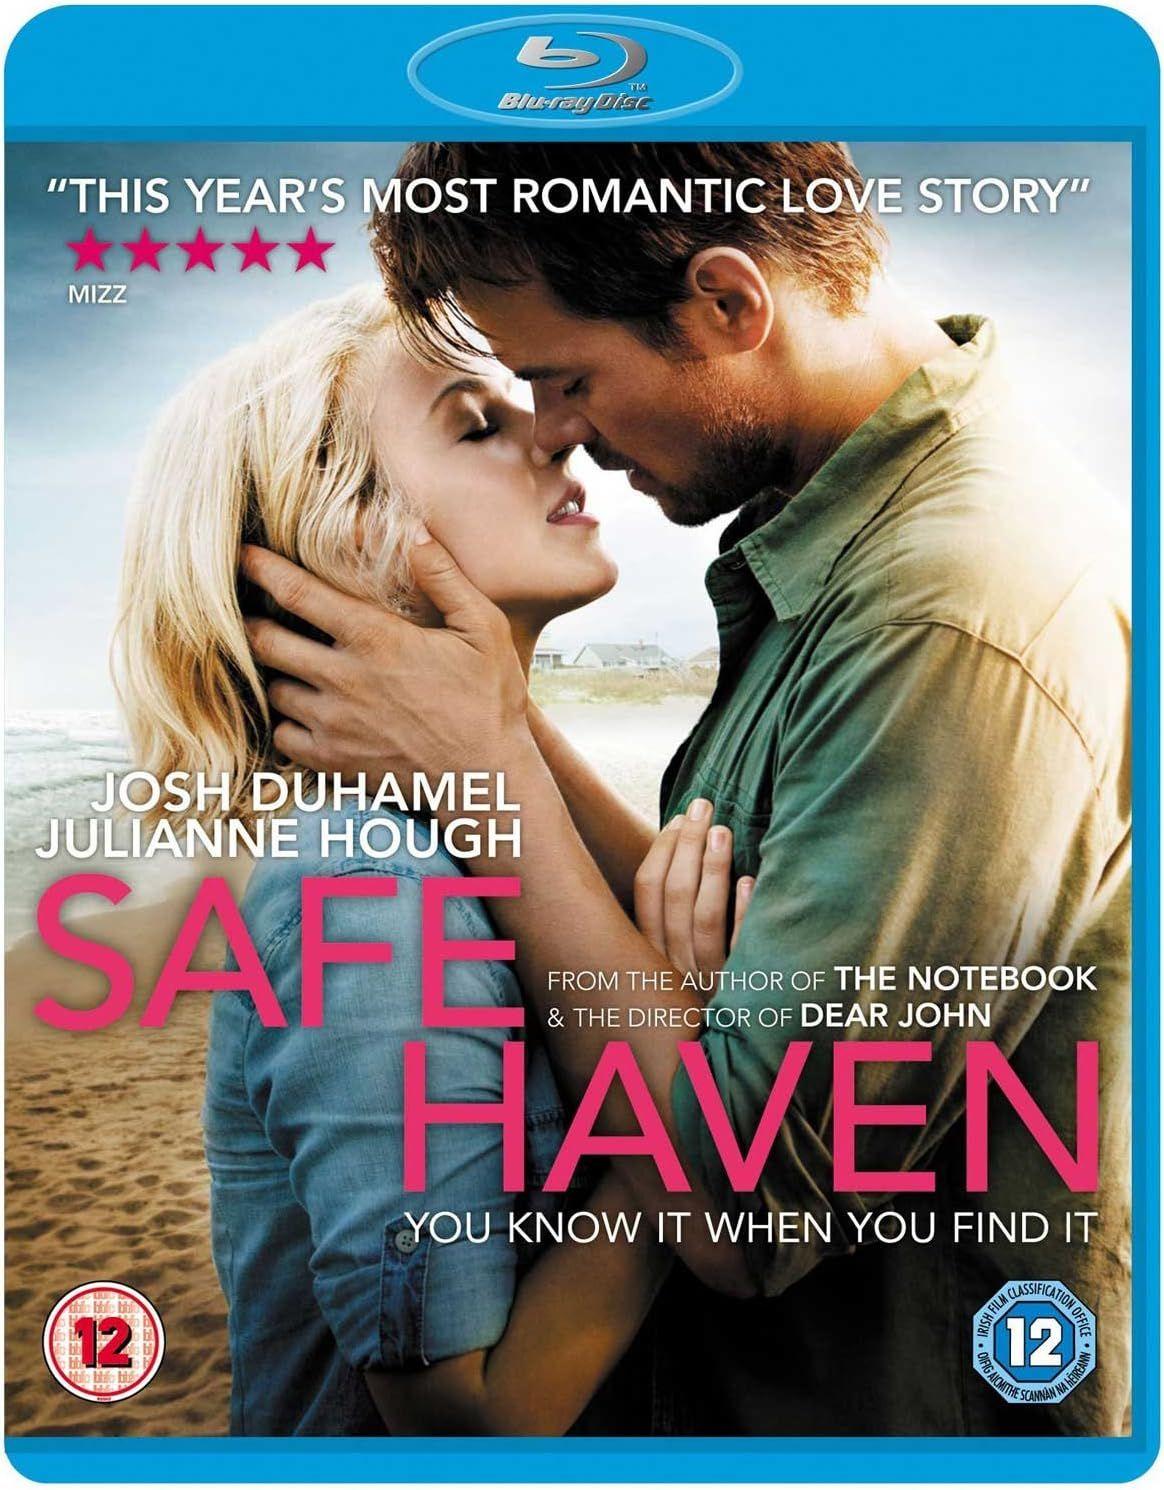 Safe Haven 2013 MULTi 1080p BluRay AC3 DTS-HDMA x264-TMB